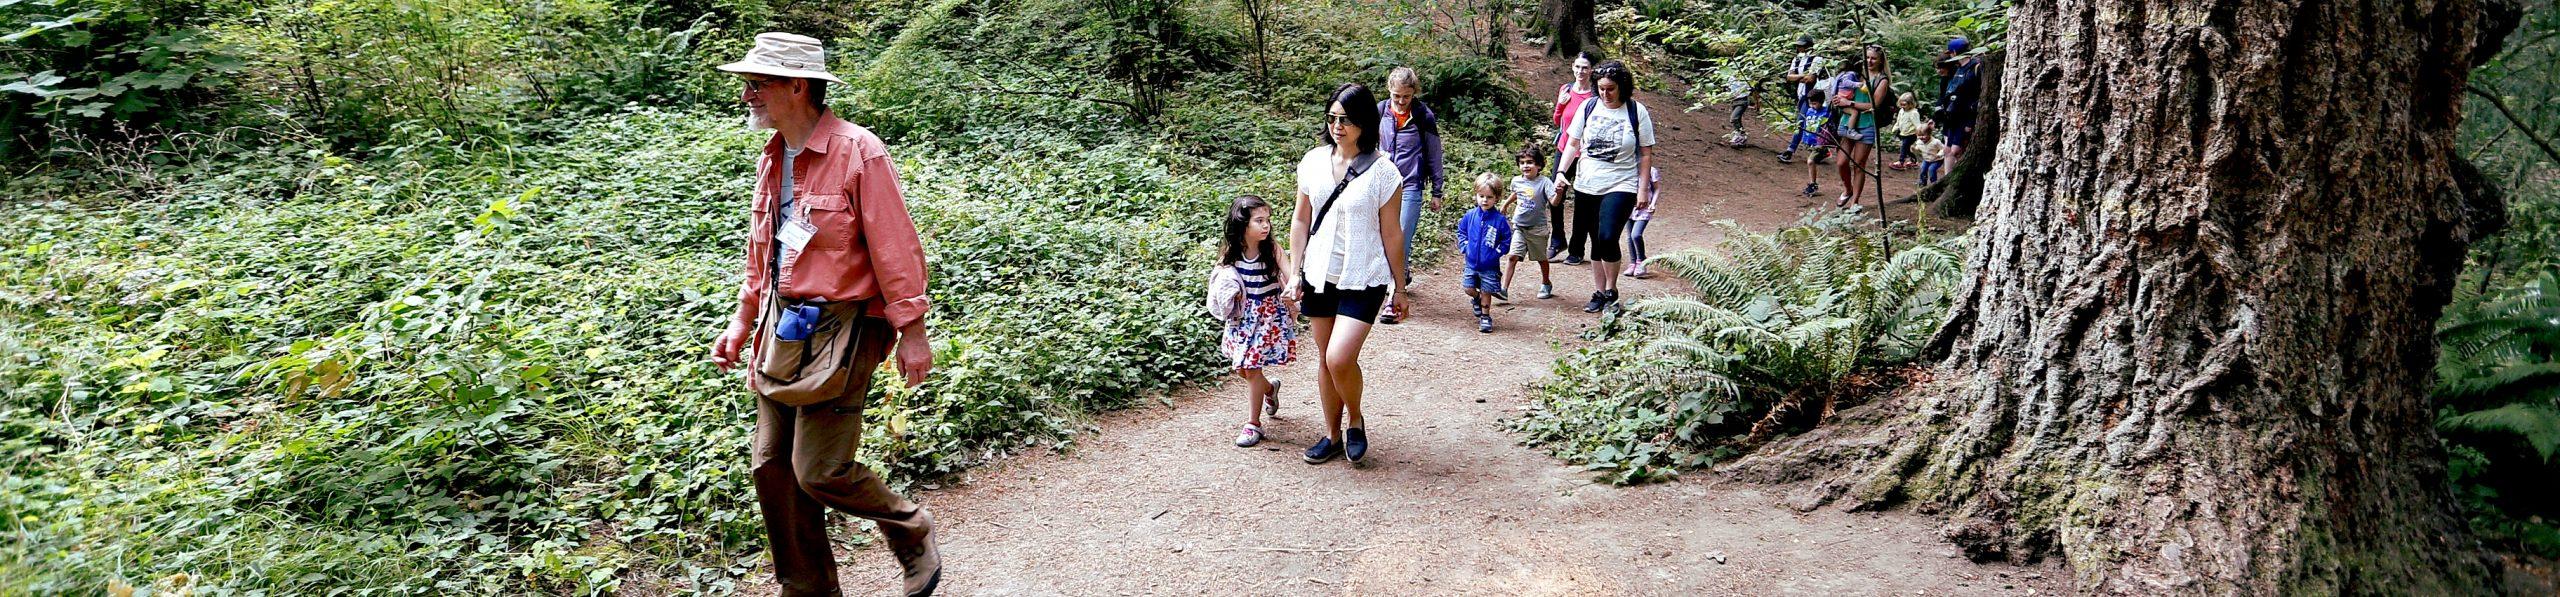 Hoyt Arboretum Family Tour